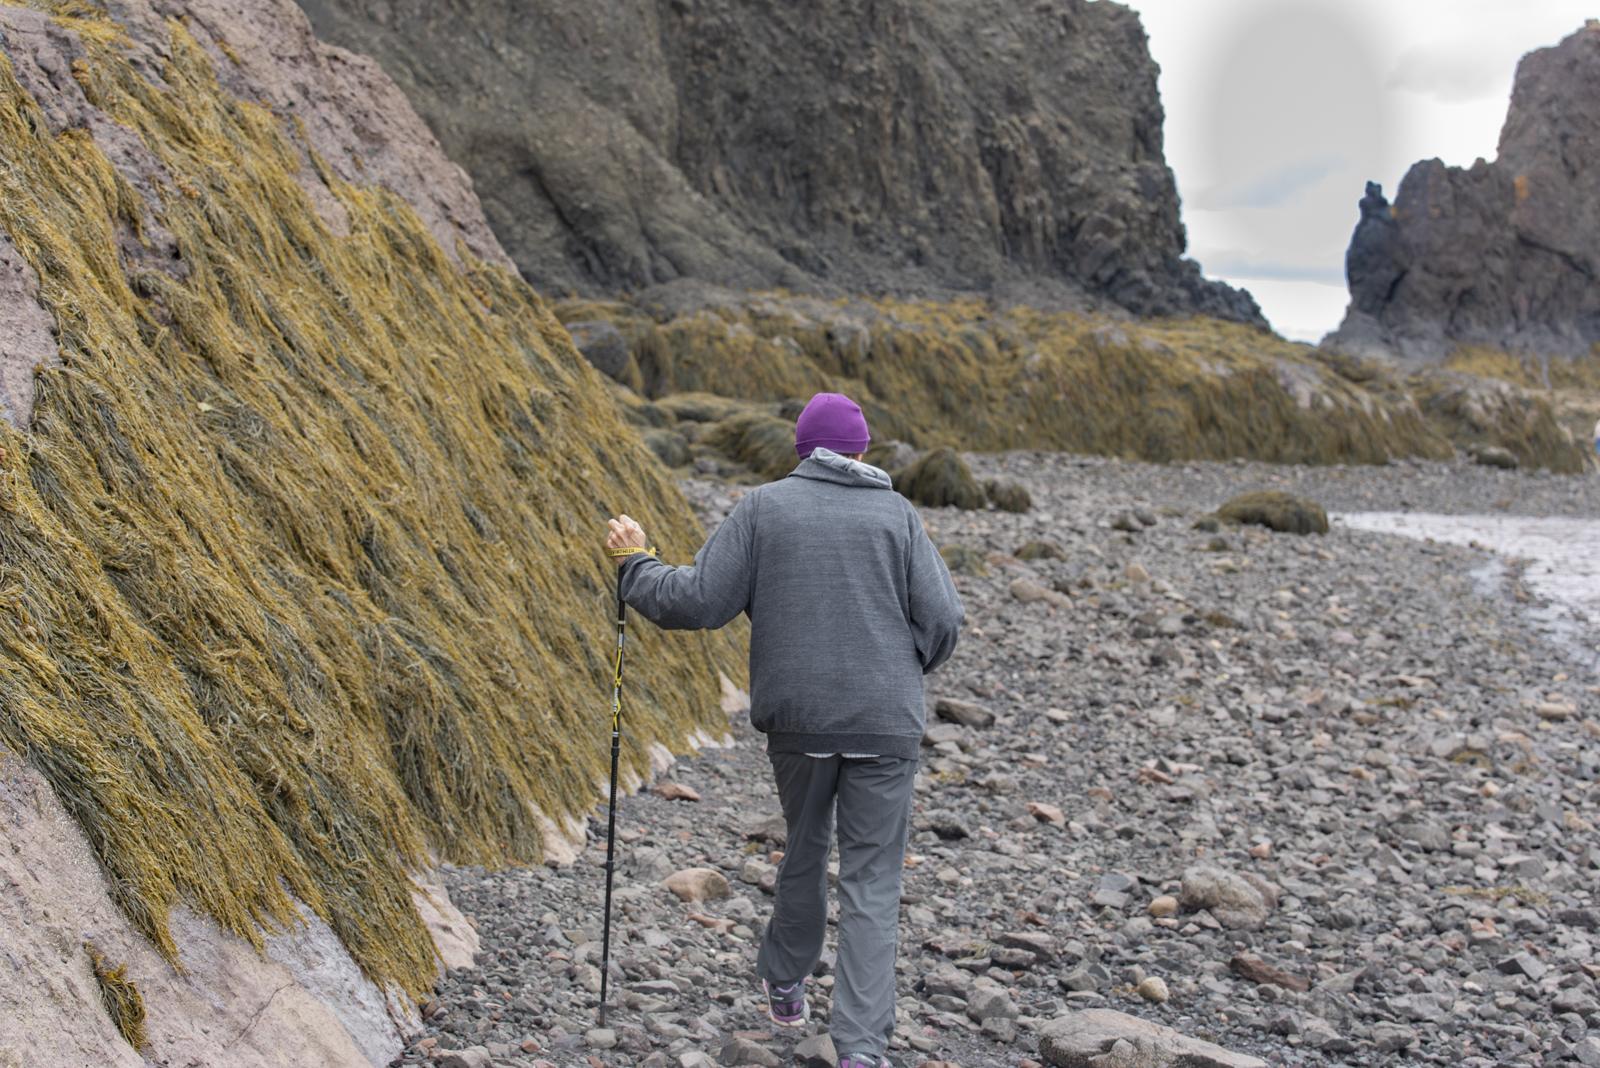 Interesting wall of seaweed.